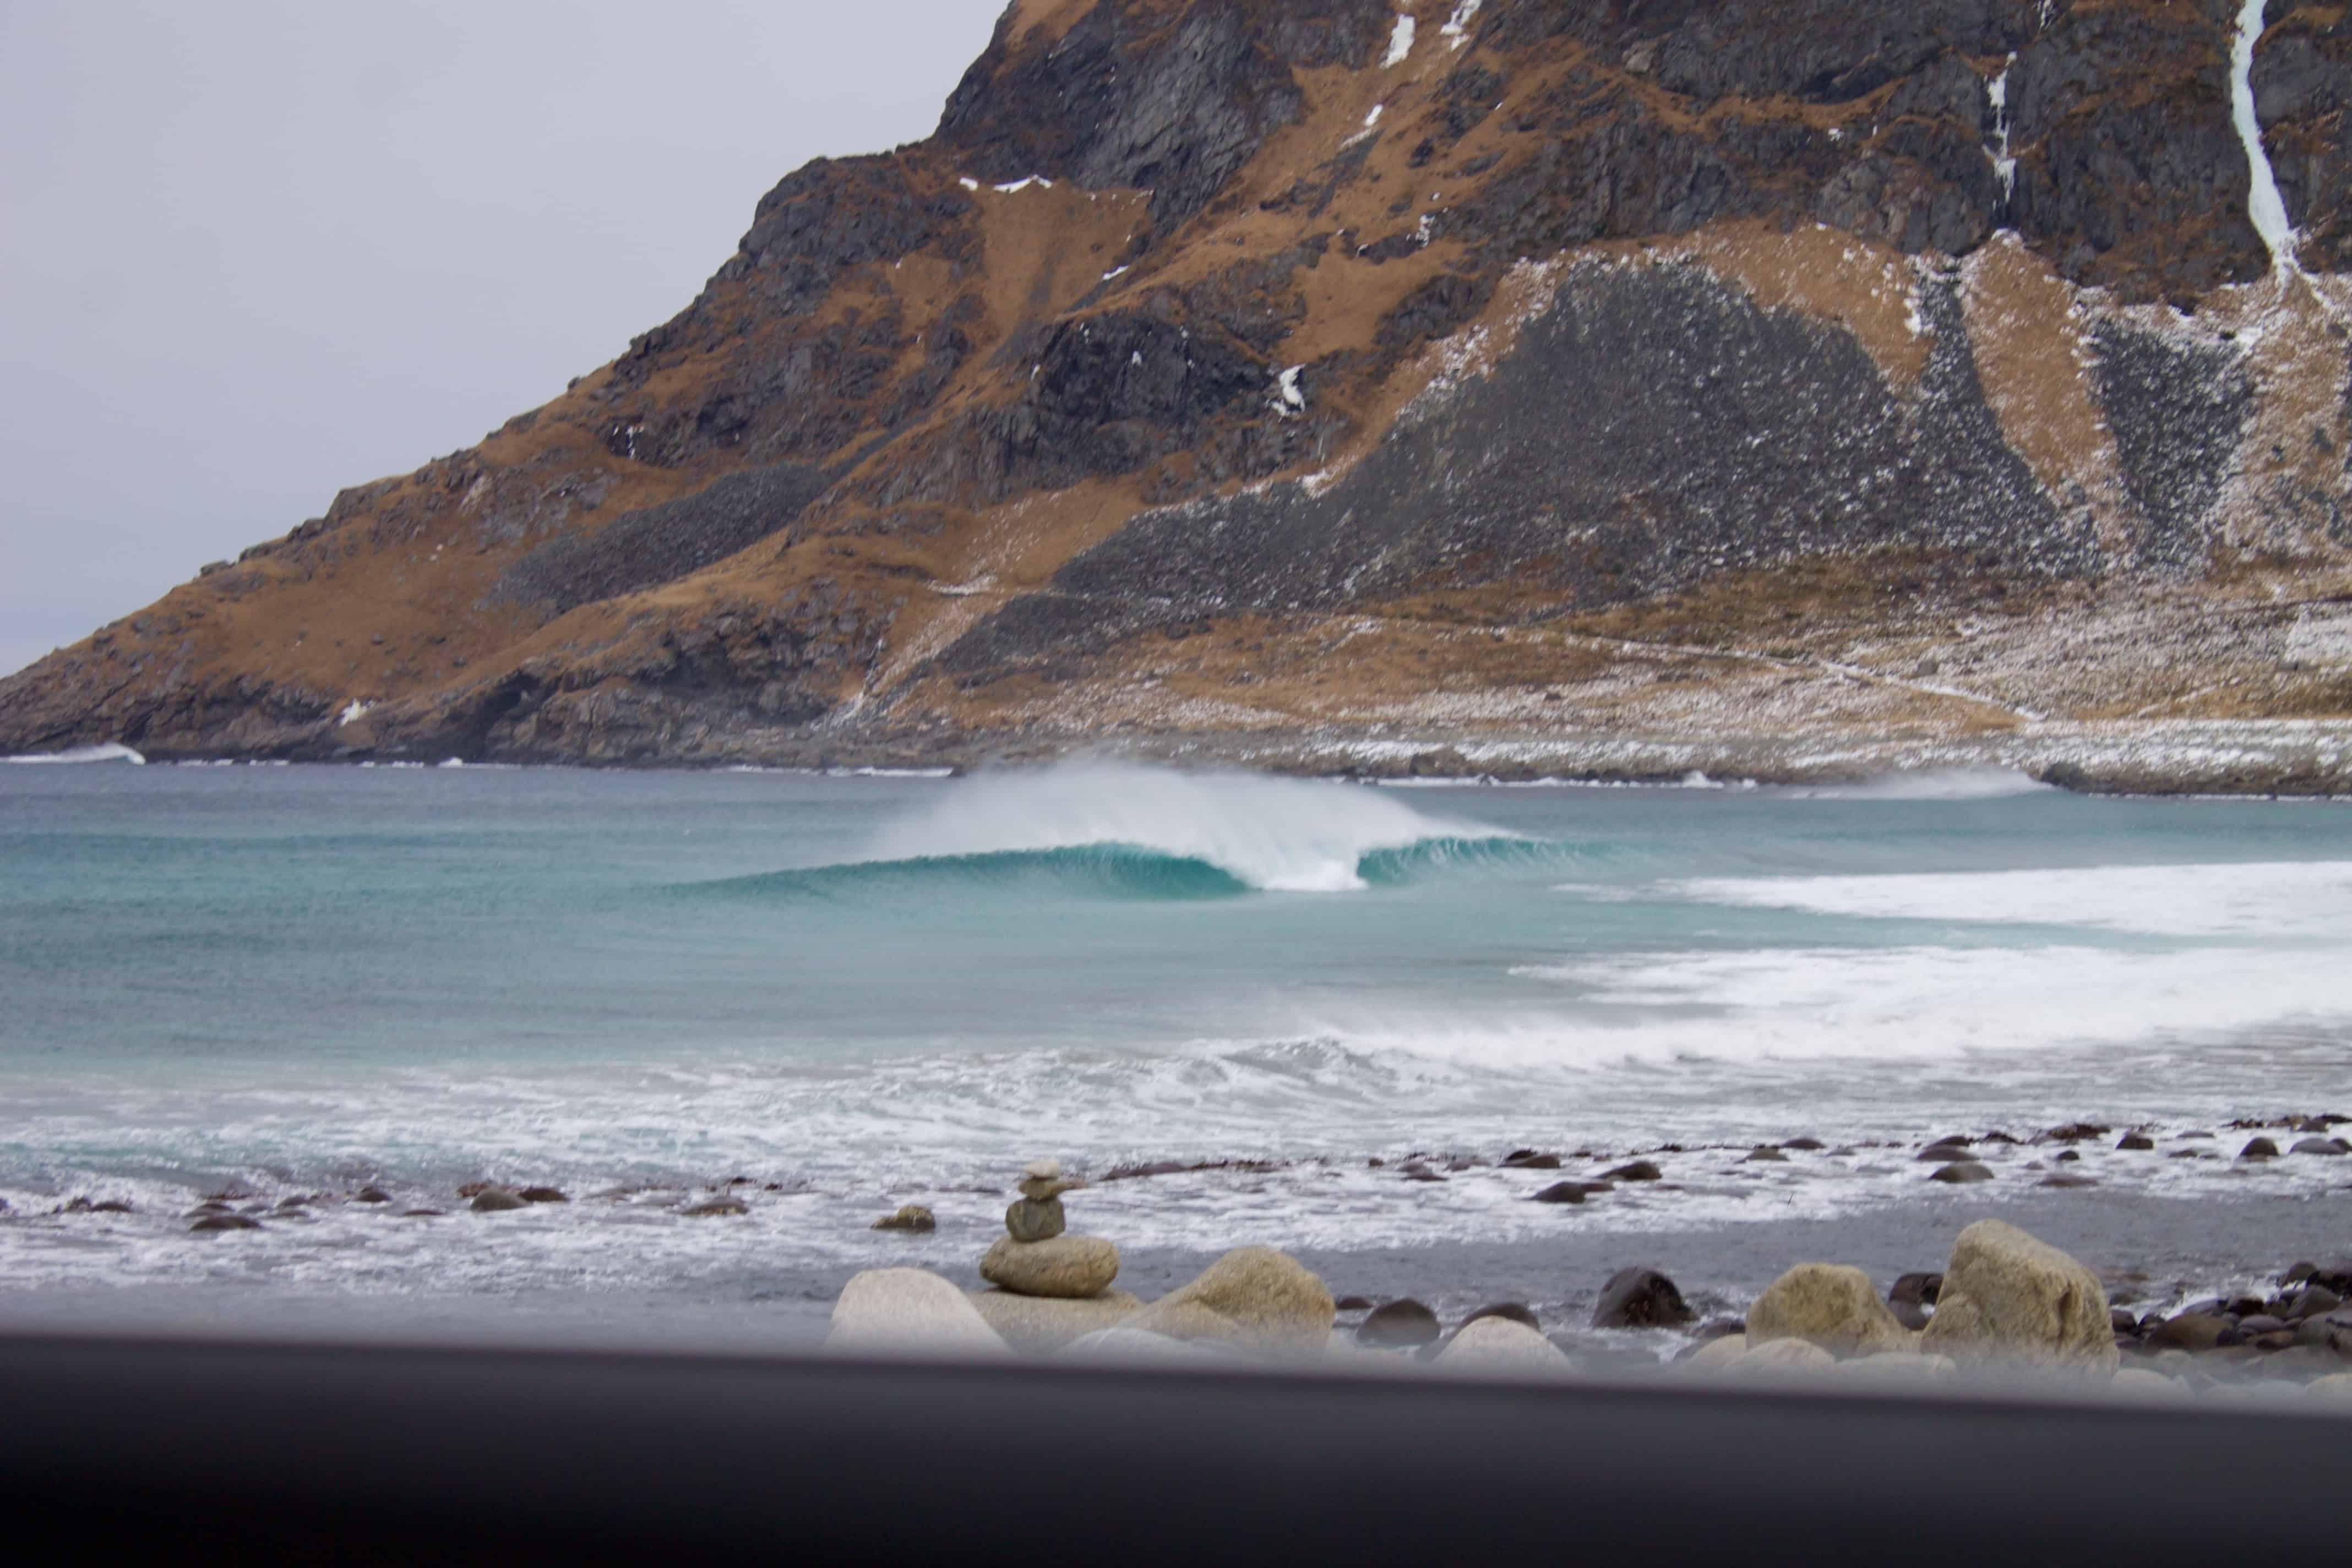 Bølger i Lofoten